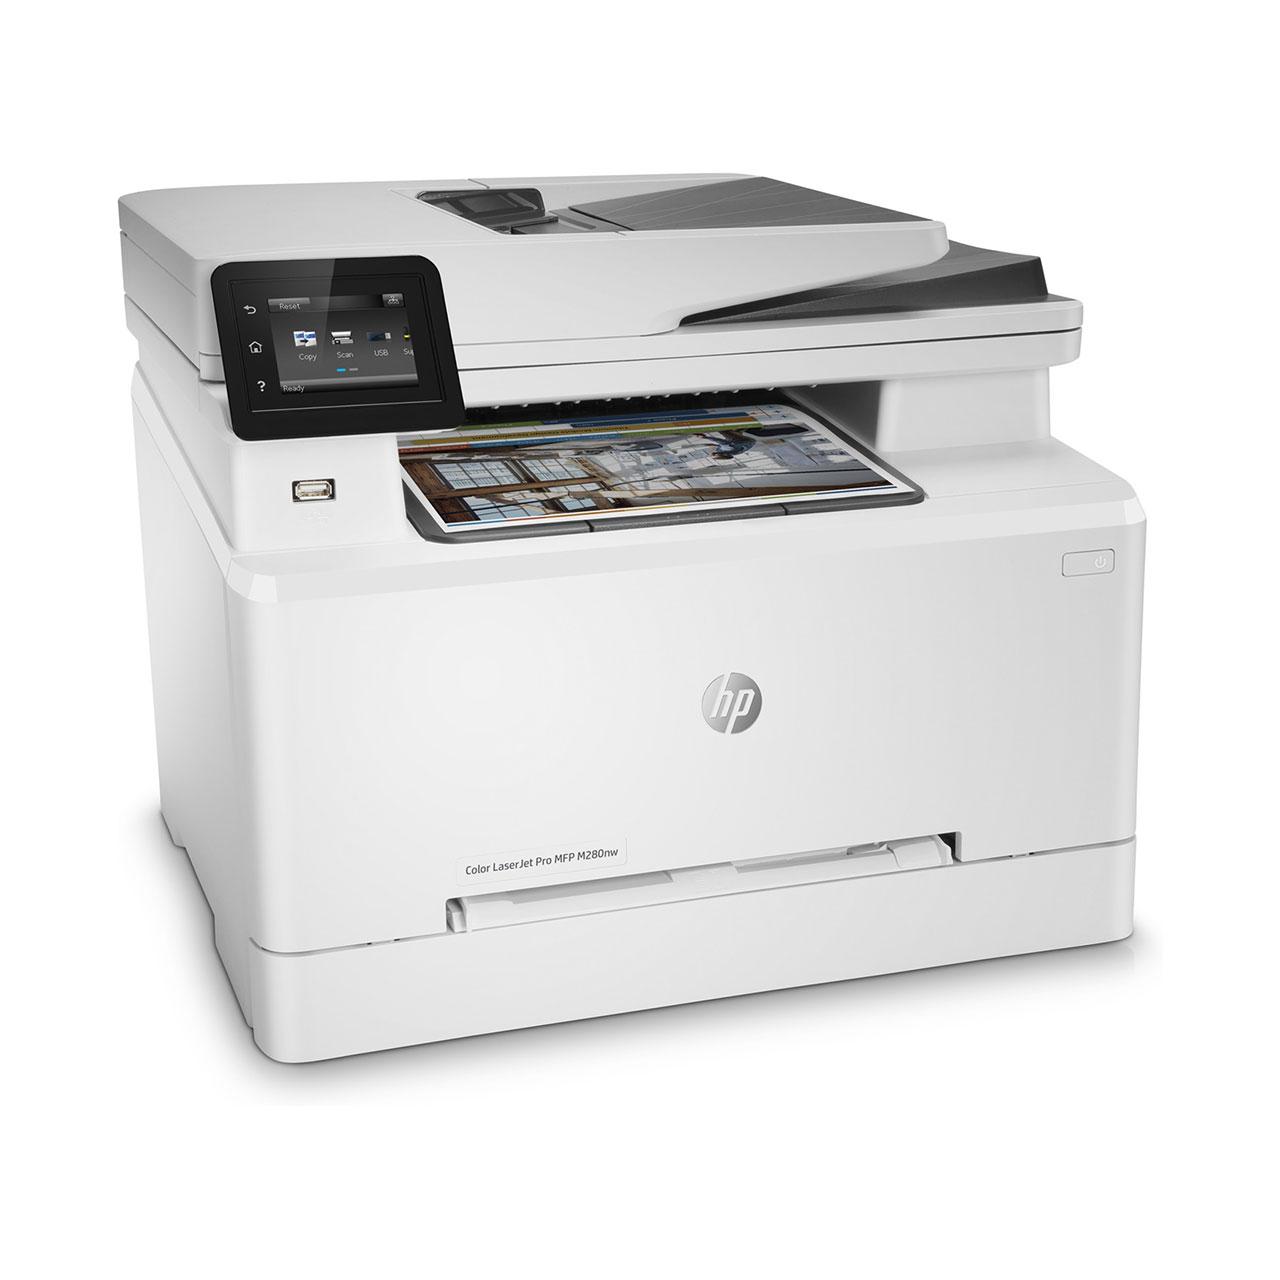 HP Color LaserJet Pro MFP M280nw toner